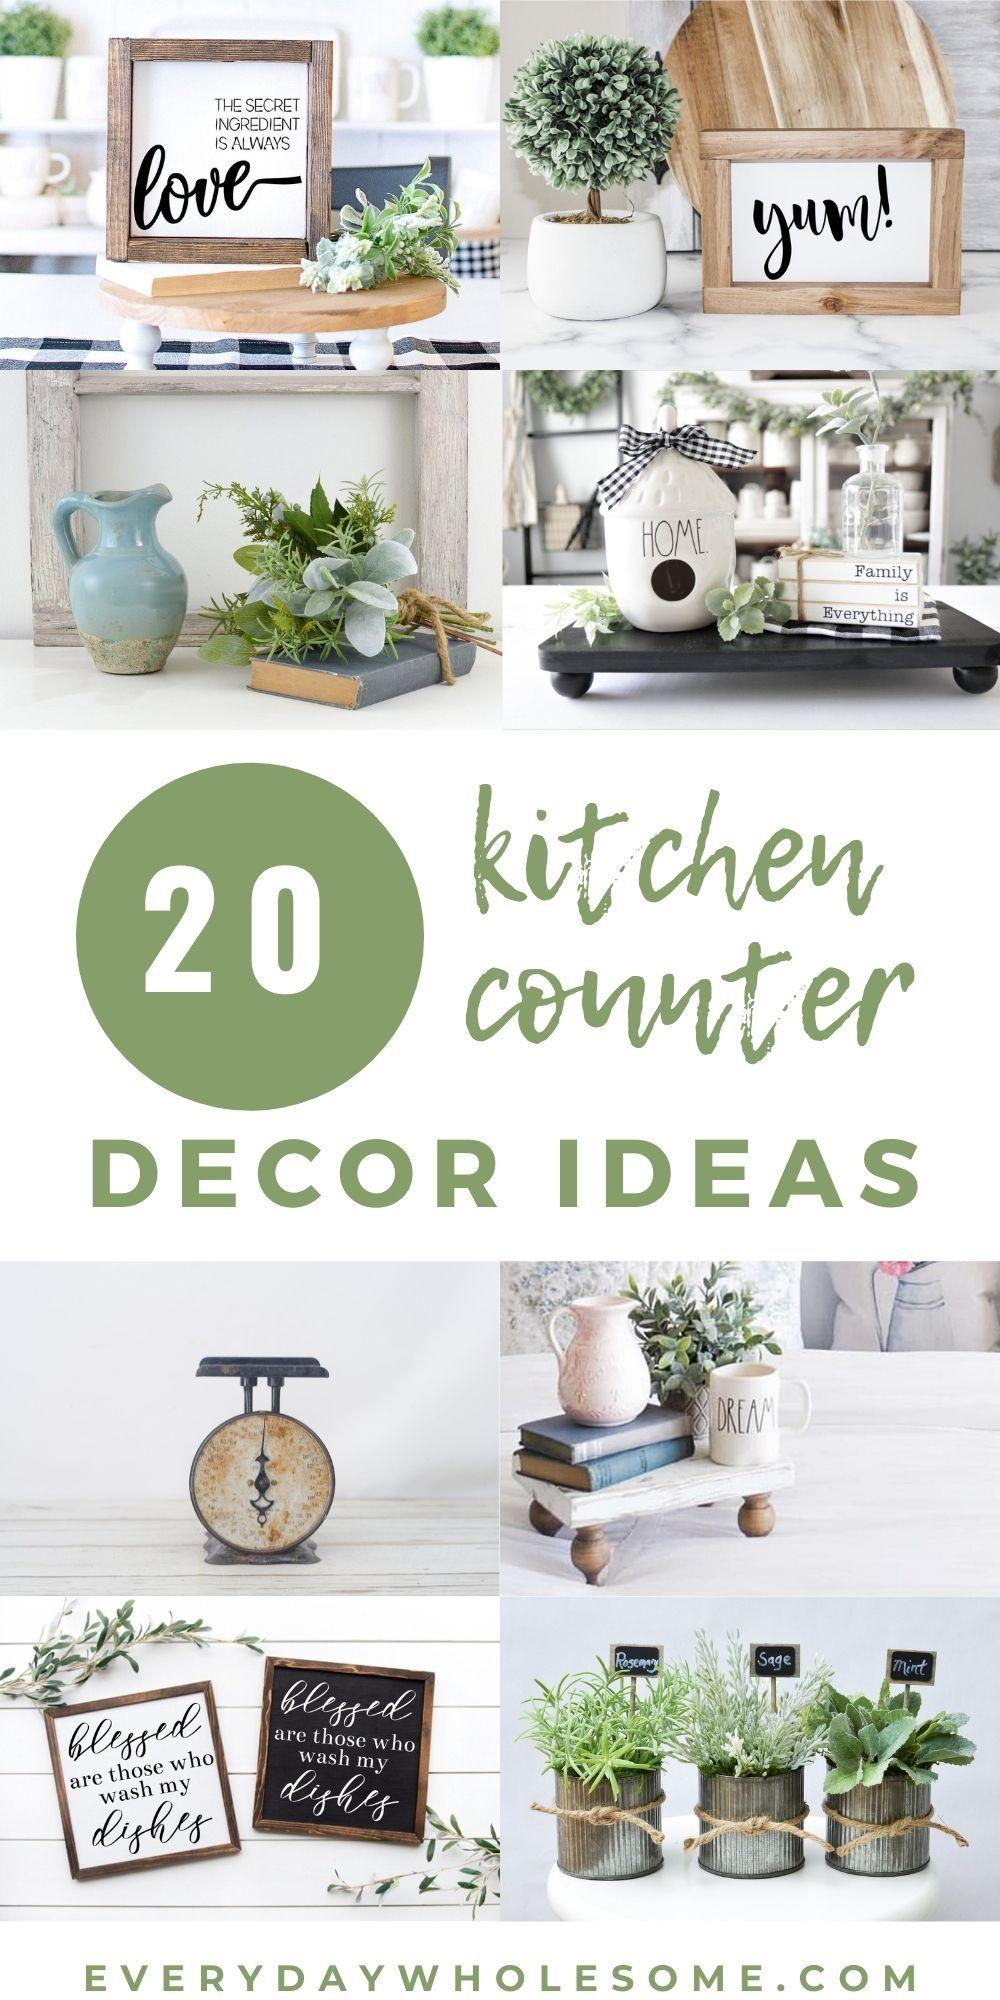 20 Kitchen Countertop Decor Ideas Kitchen Countertop Decor Kitchen Tray Decor Countertop Decor